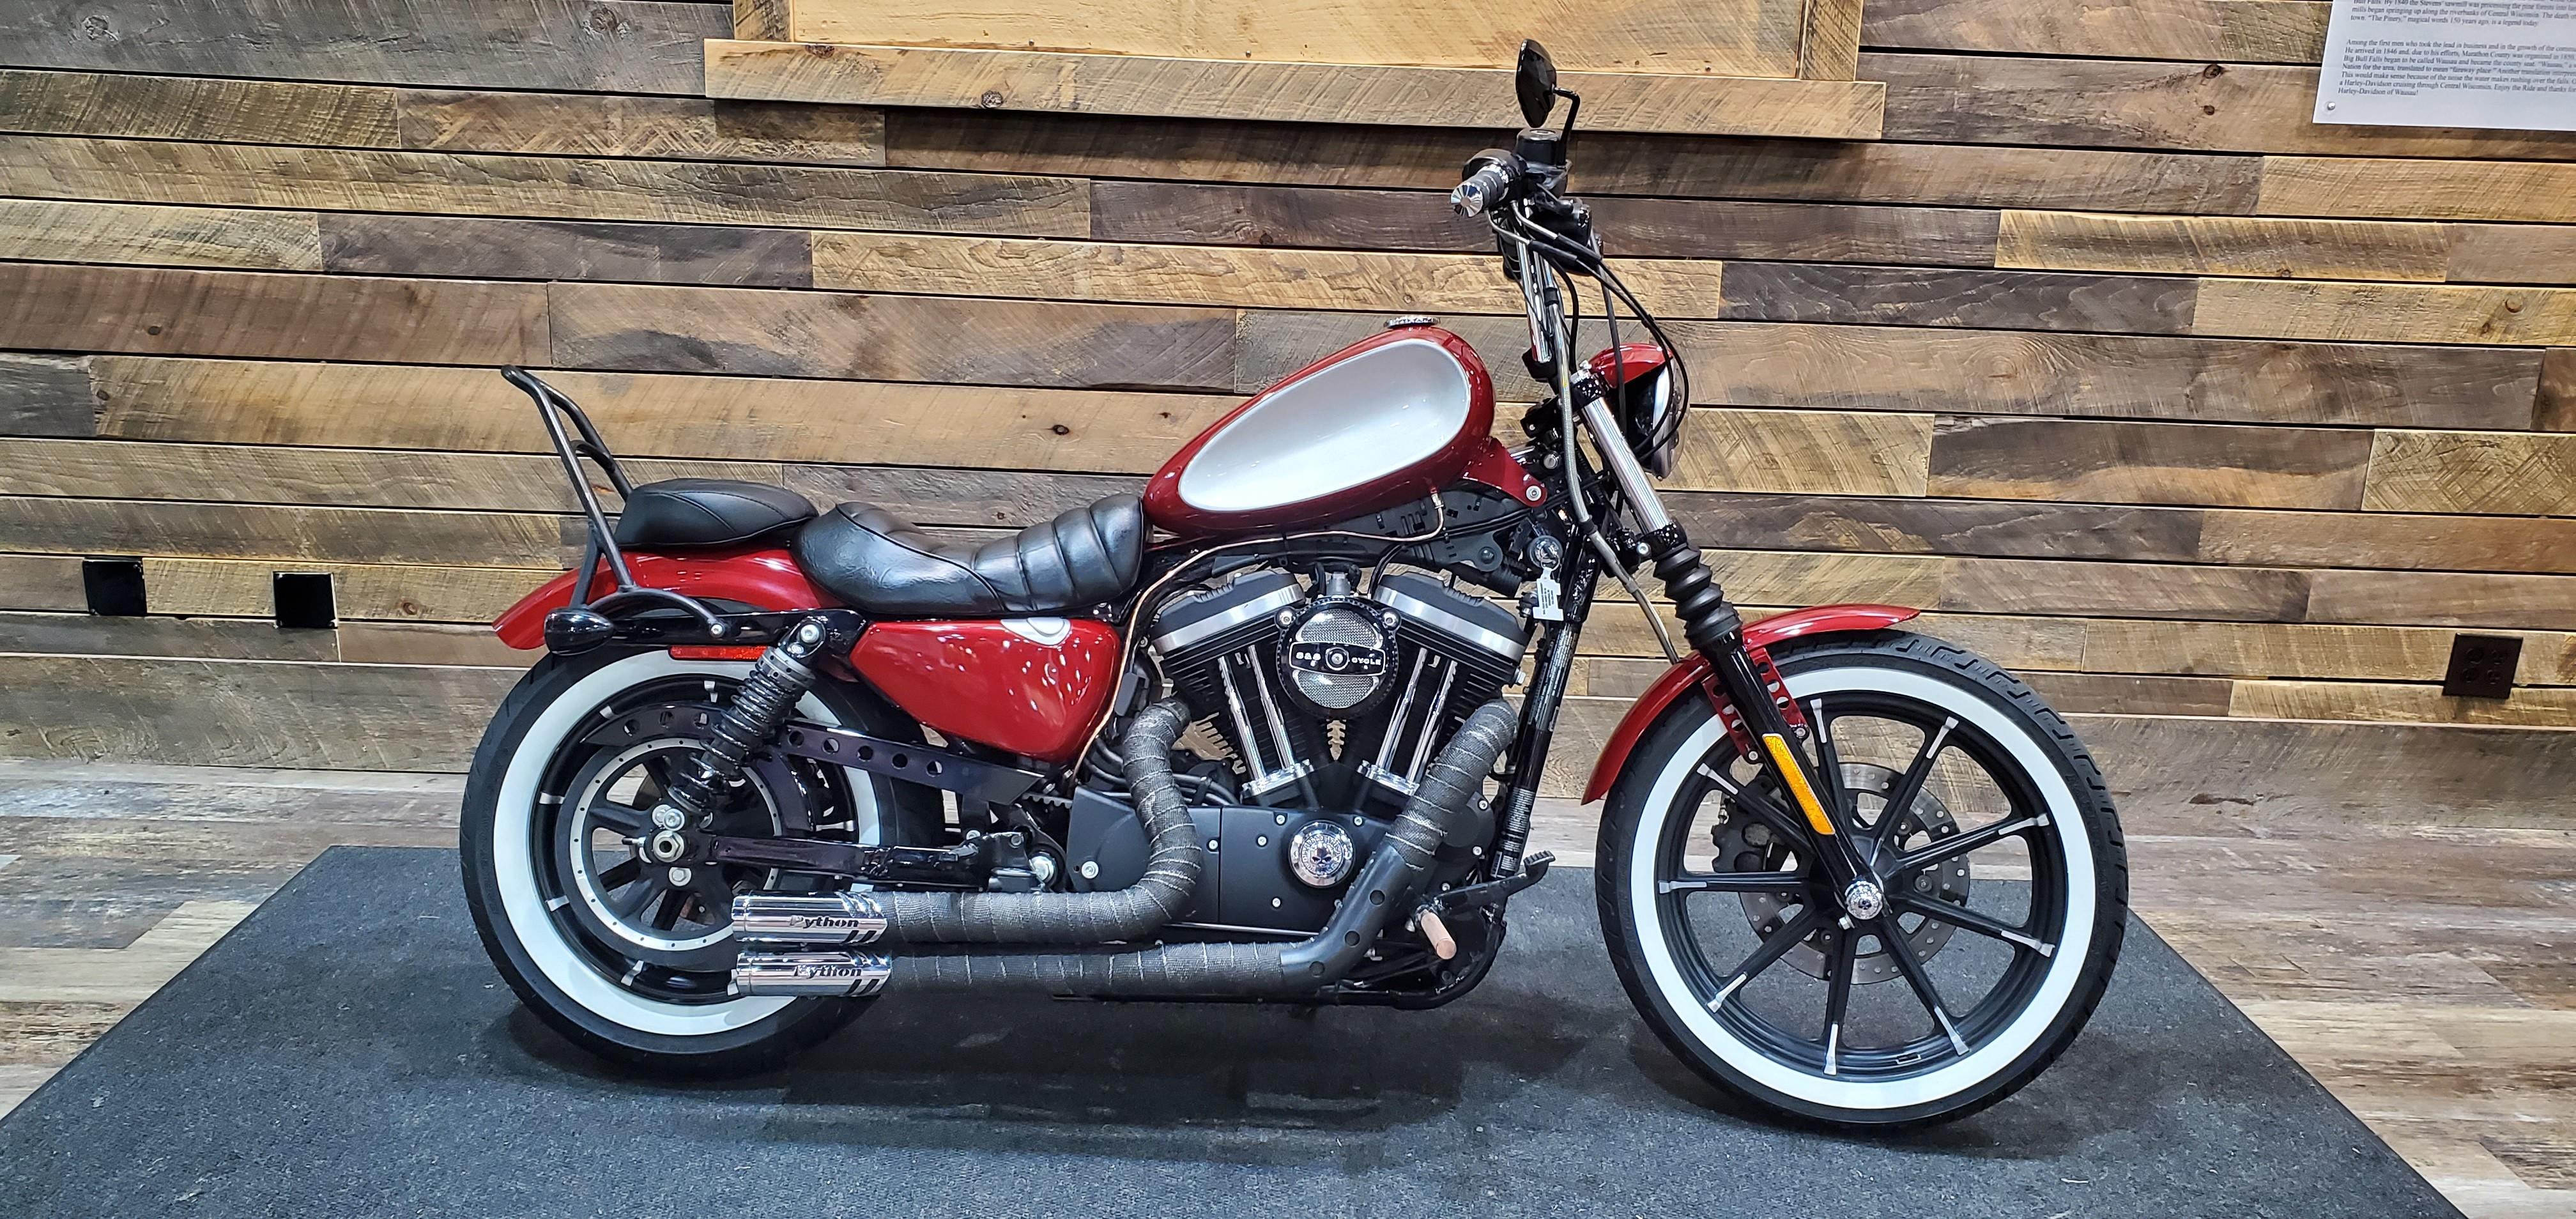 2017 Harley-Davidson Sportster Iron 883 at Bull Falls Harley-Davidson